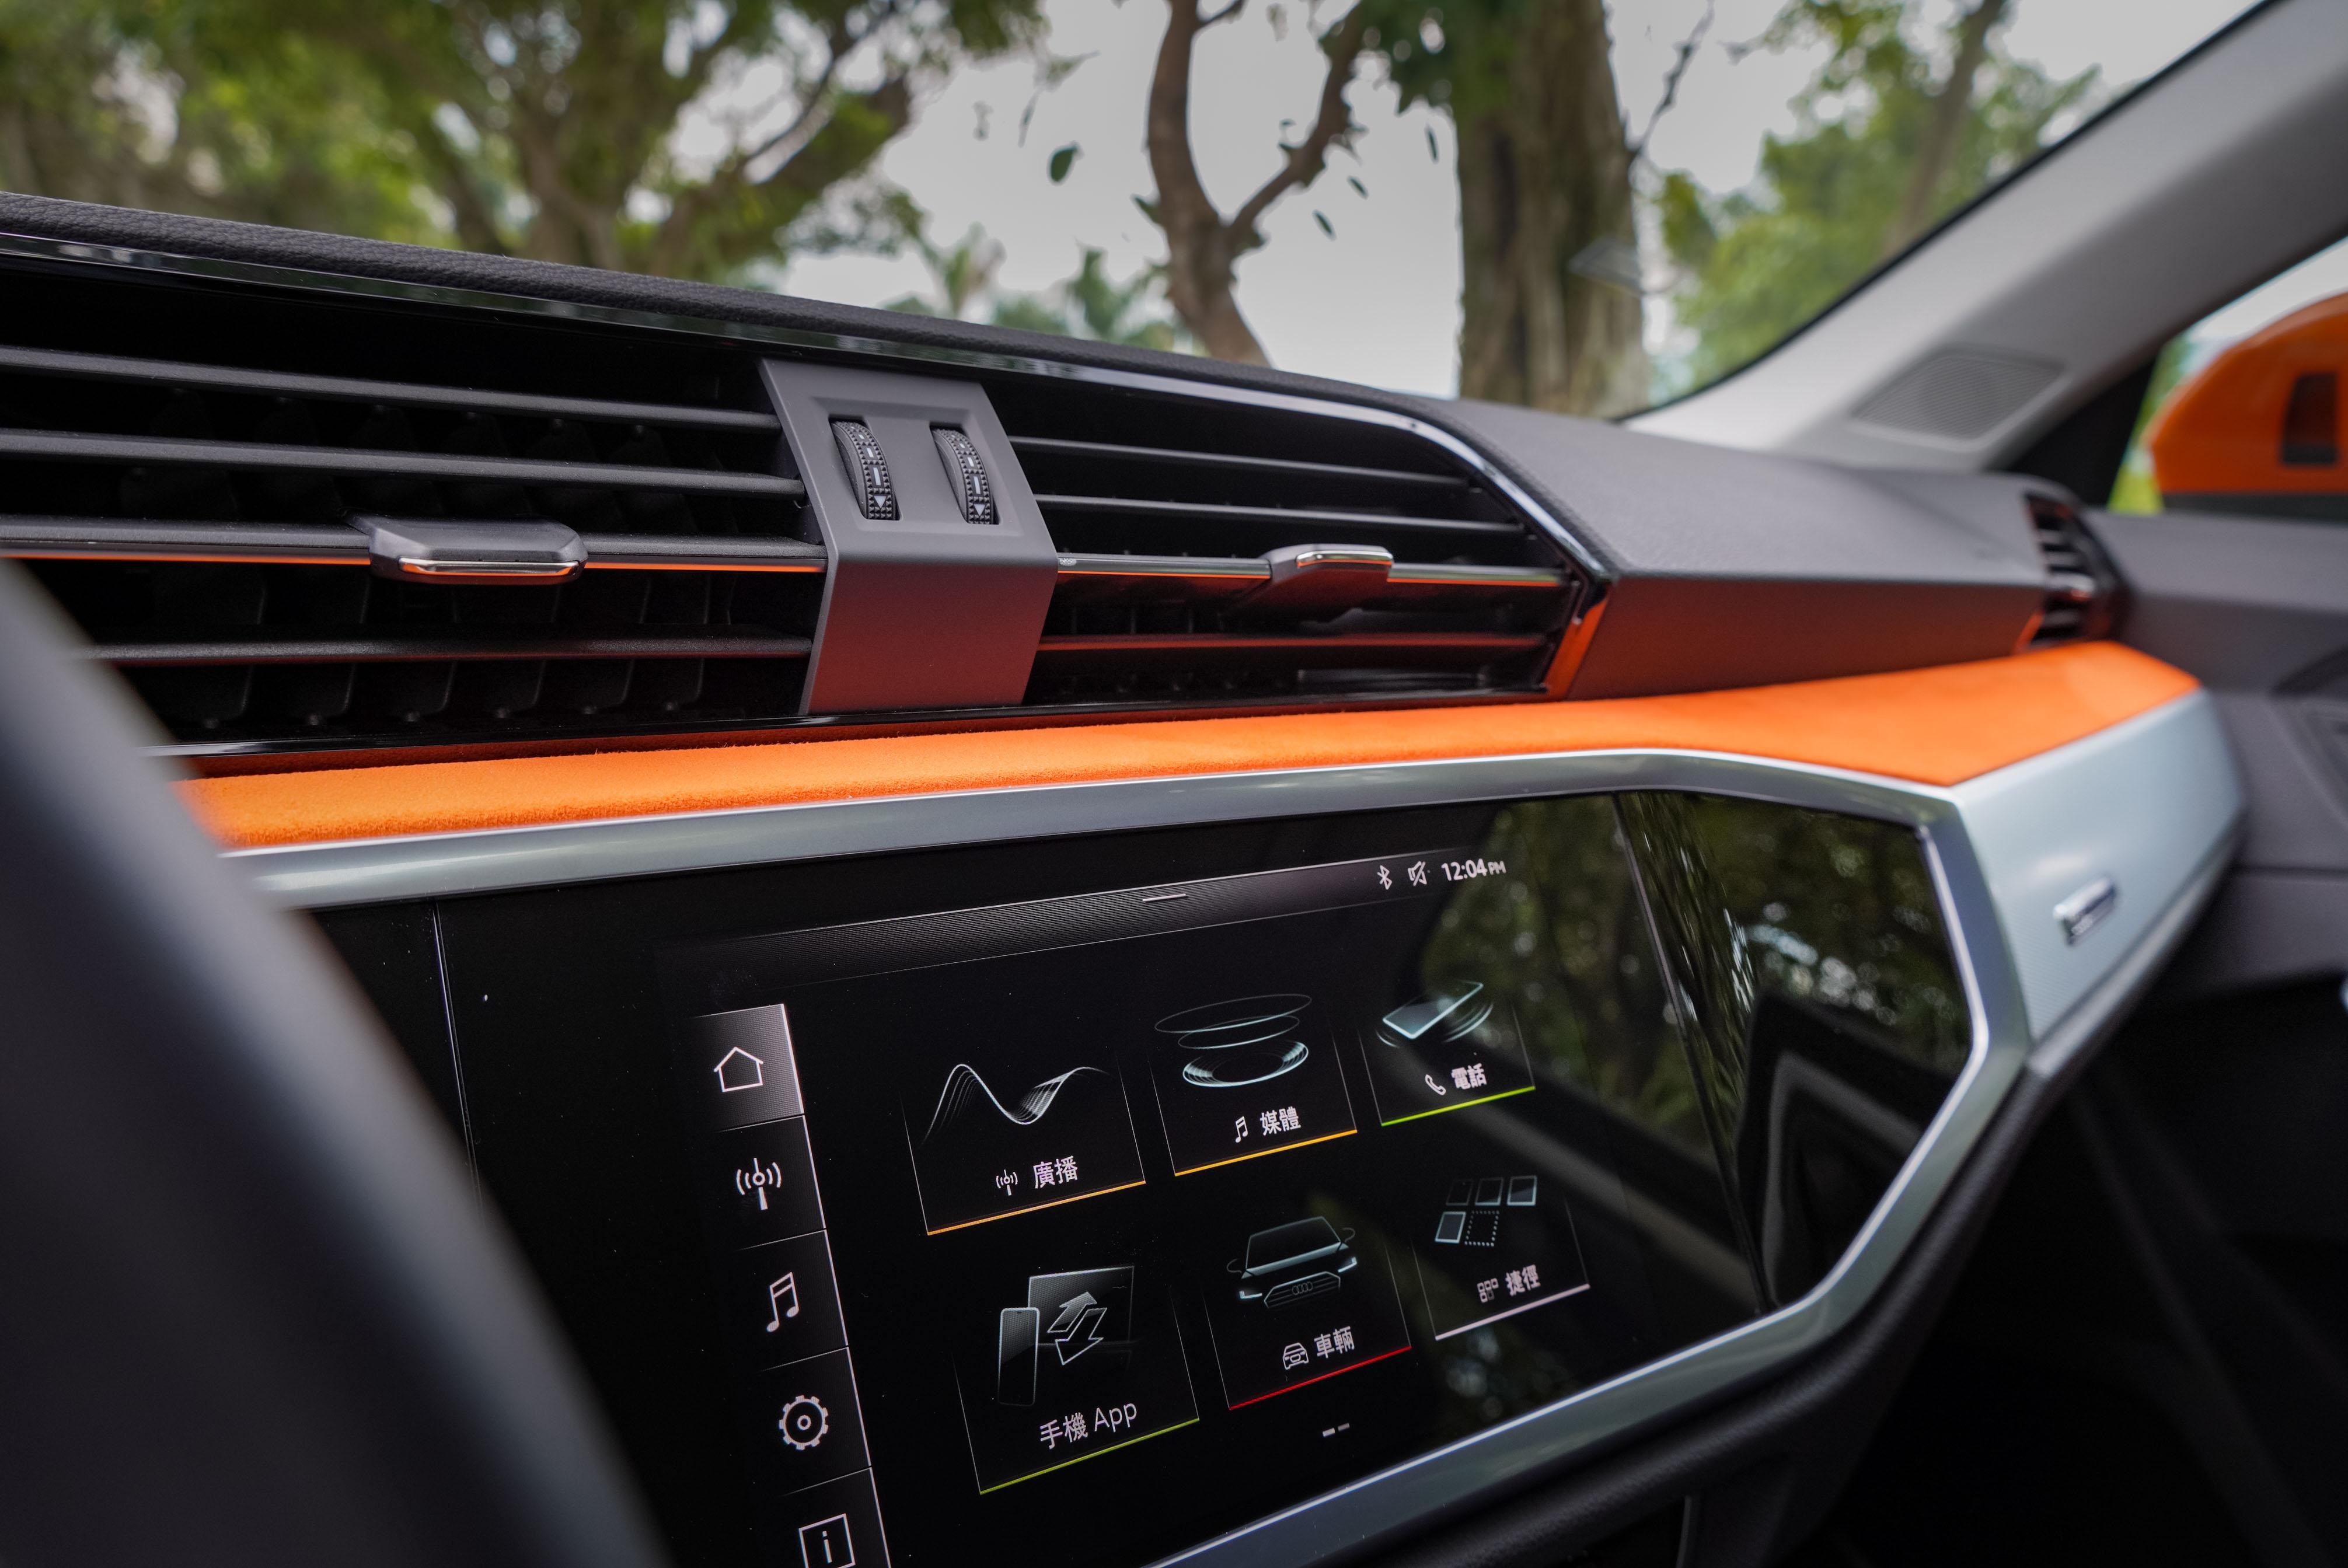 8.8 吋觸控螢幕支援 Android Auto 與 Apple CarPlay。